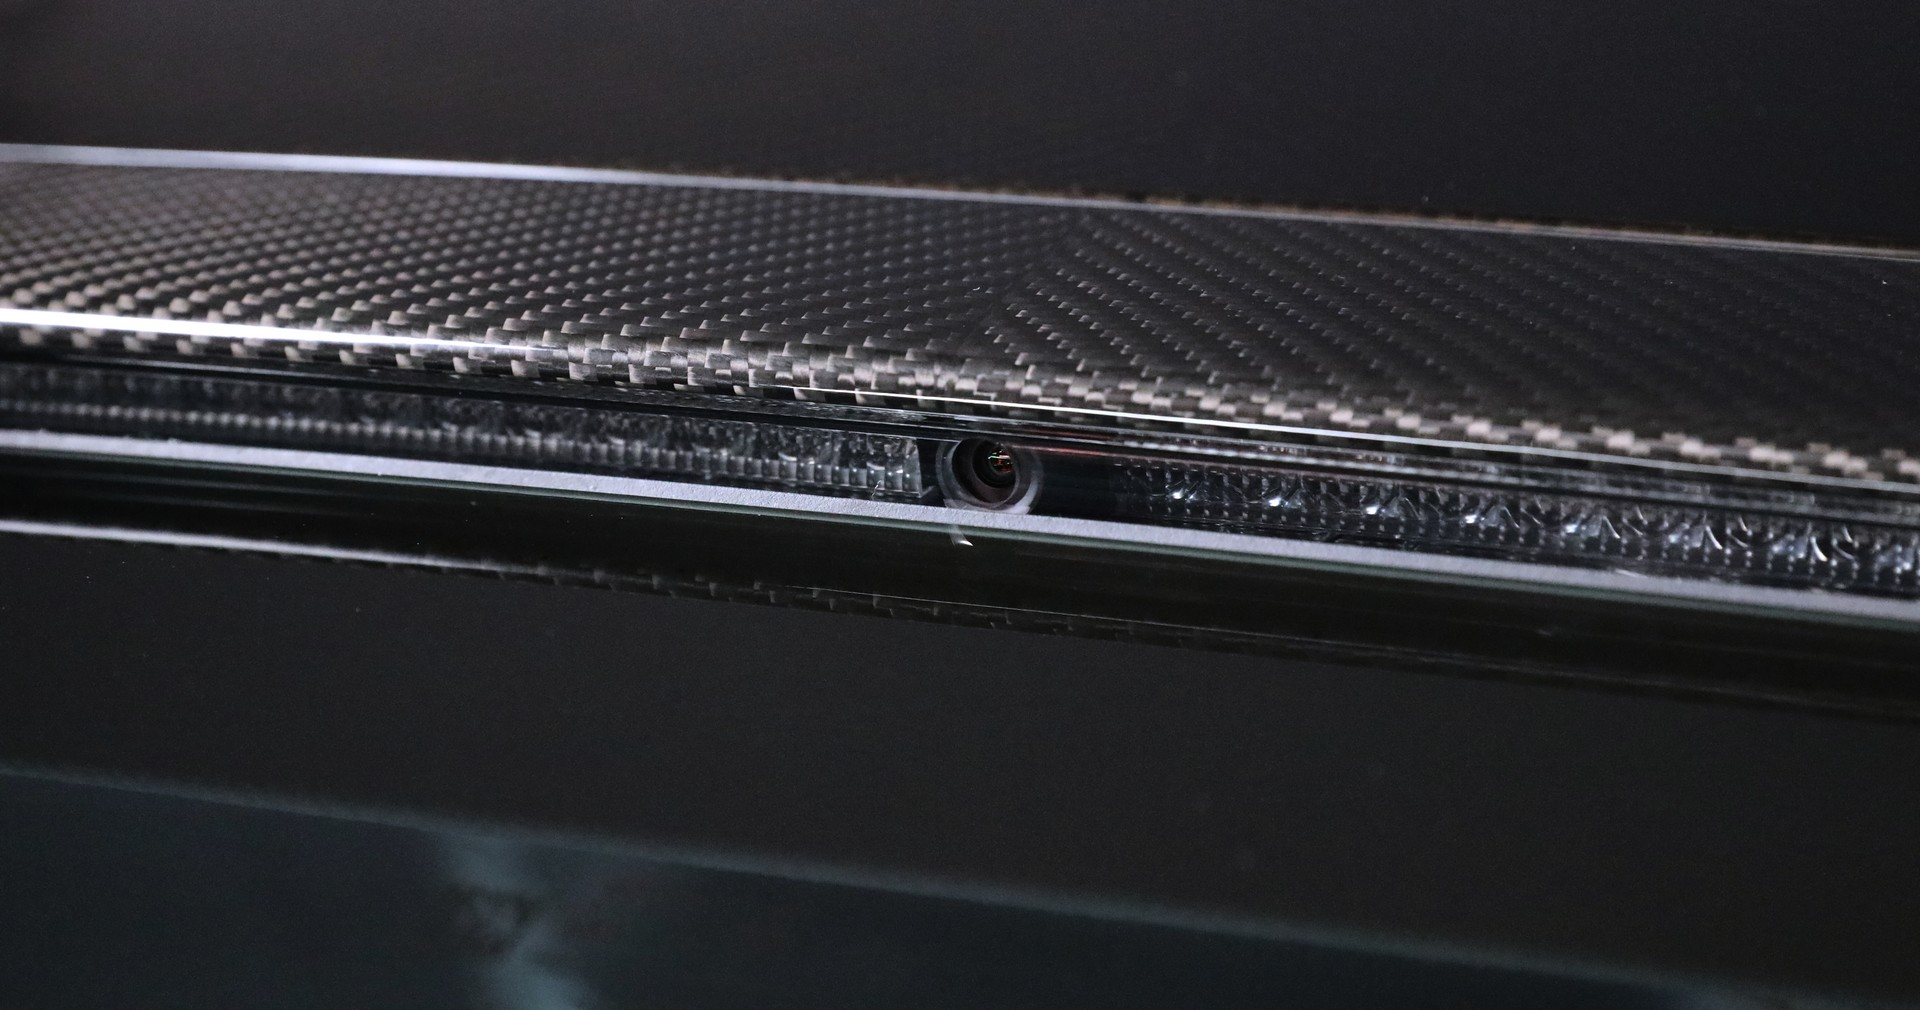 Aston-Martin-tri-camera-rearview-mirror-system-4